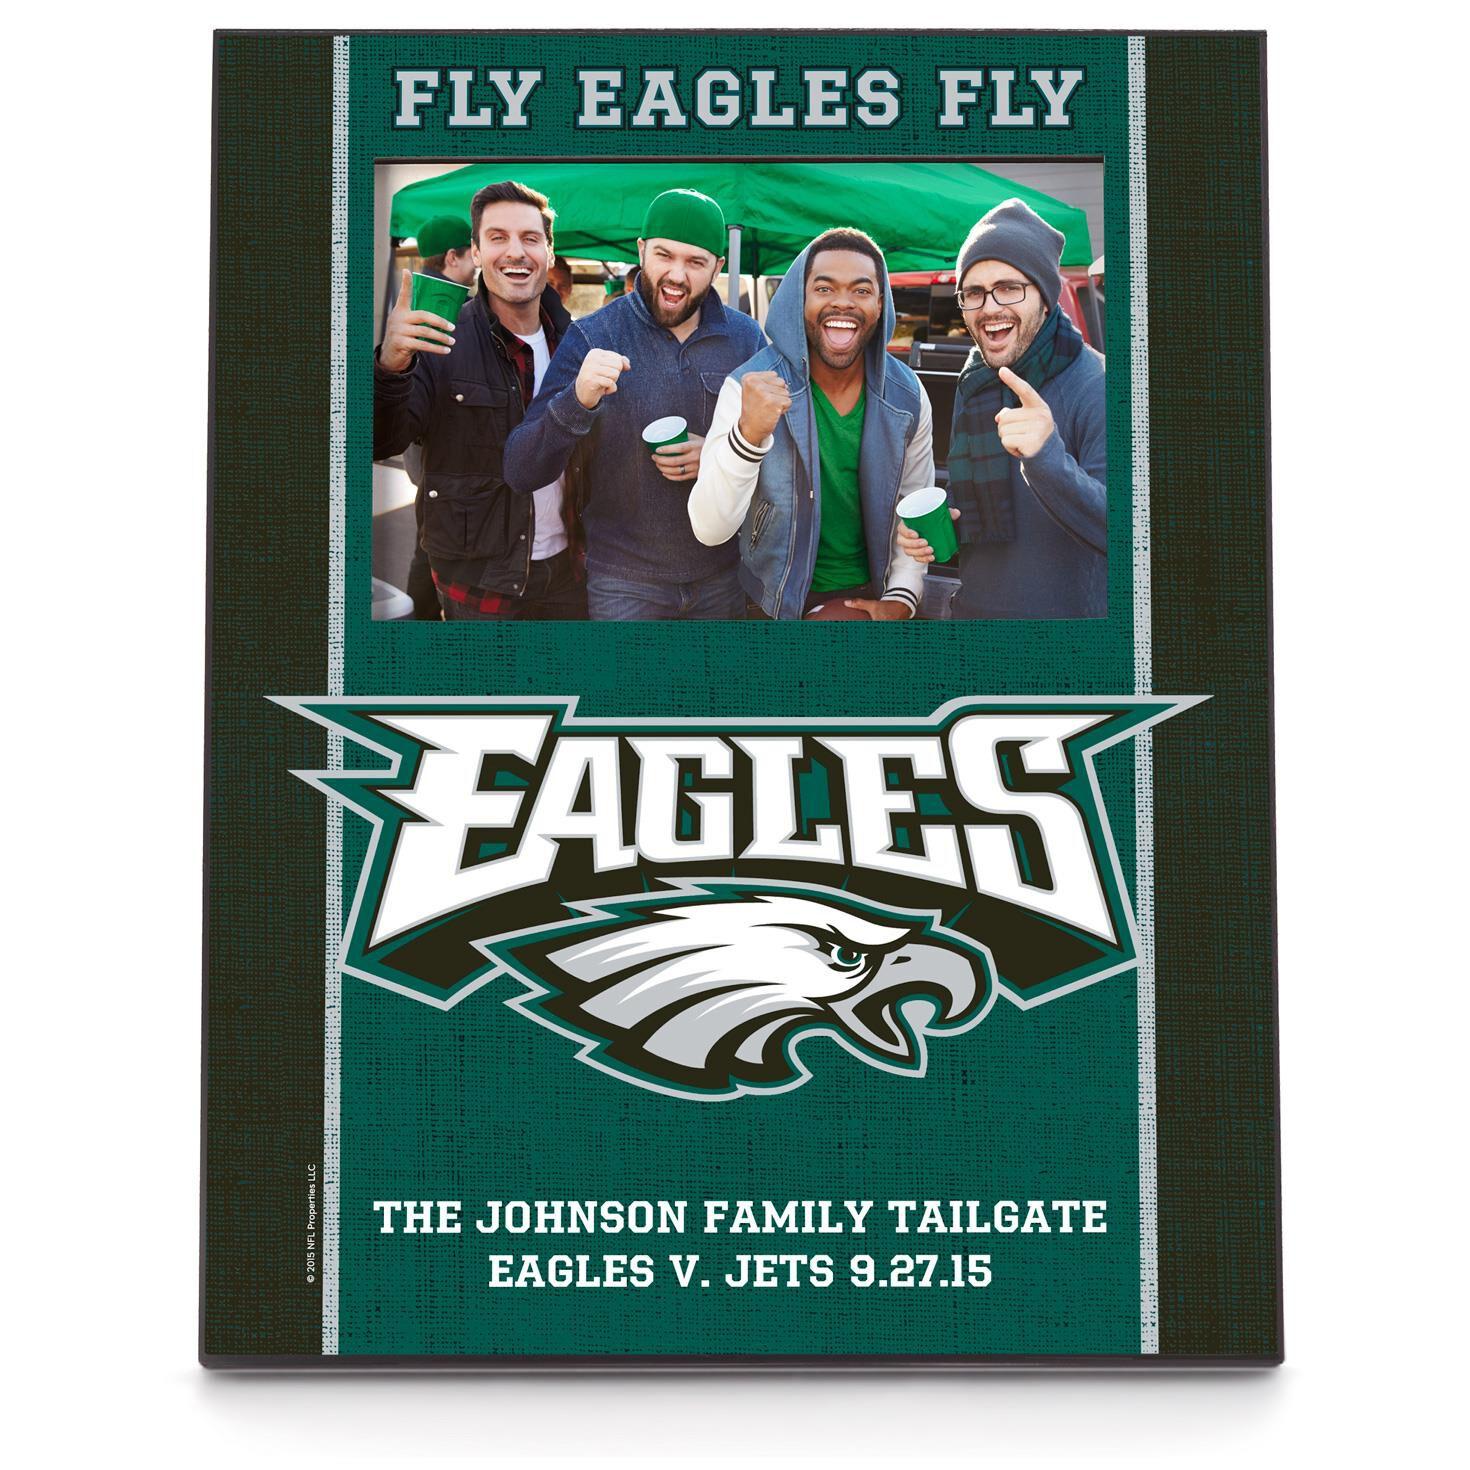 Philadelphia eagles personalized 4x6 picture frame personalized philadelphia eagles personalized 4x6 picture frame personalized home decor hallmark jeuxipadfo Image collections